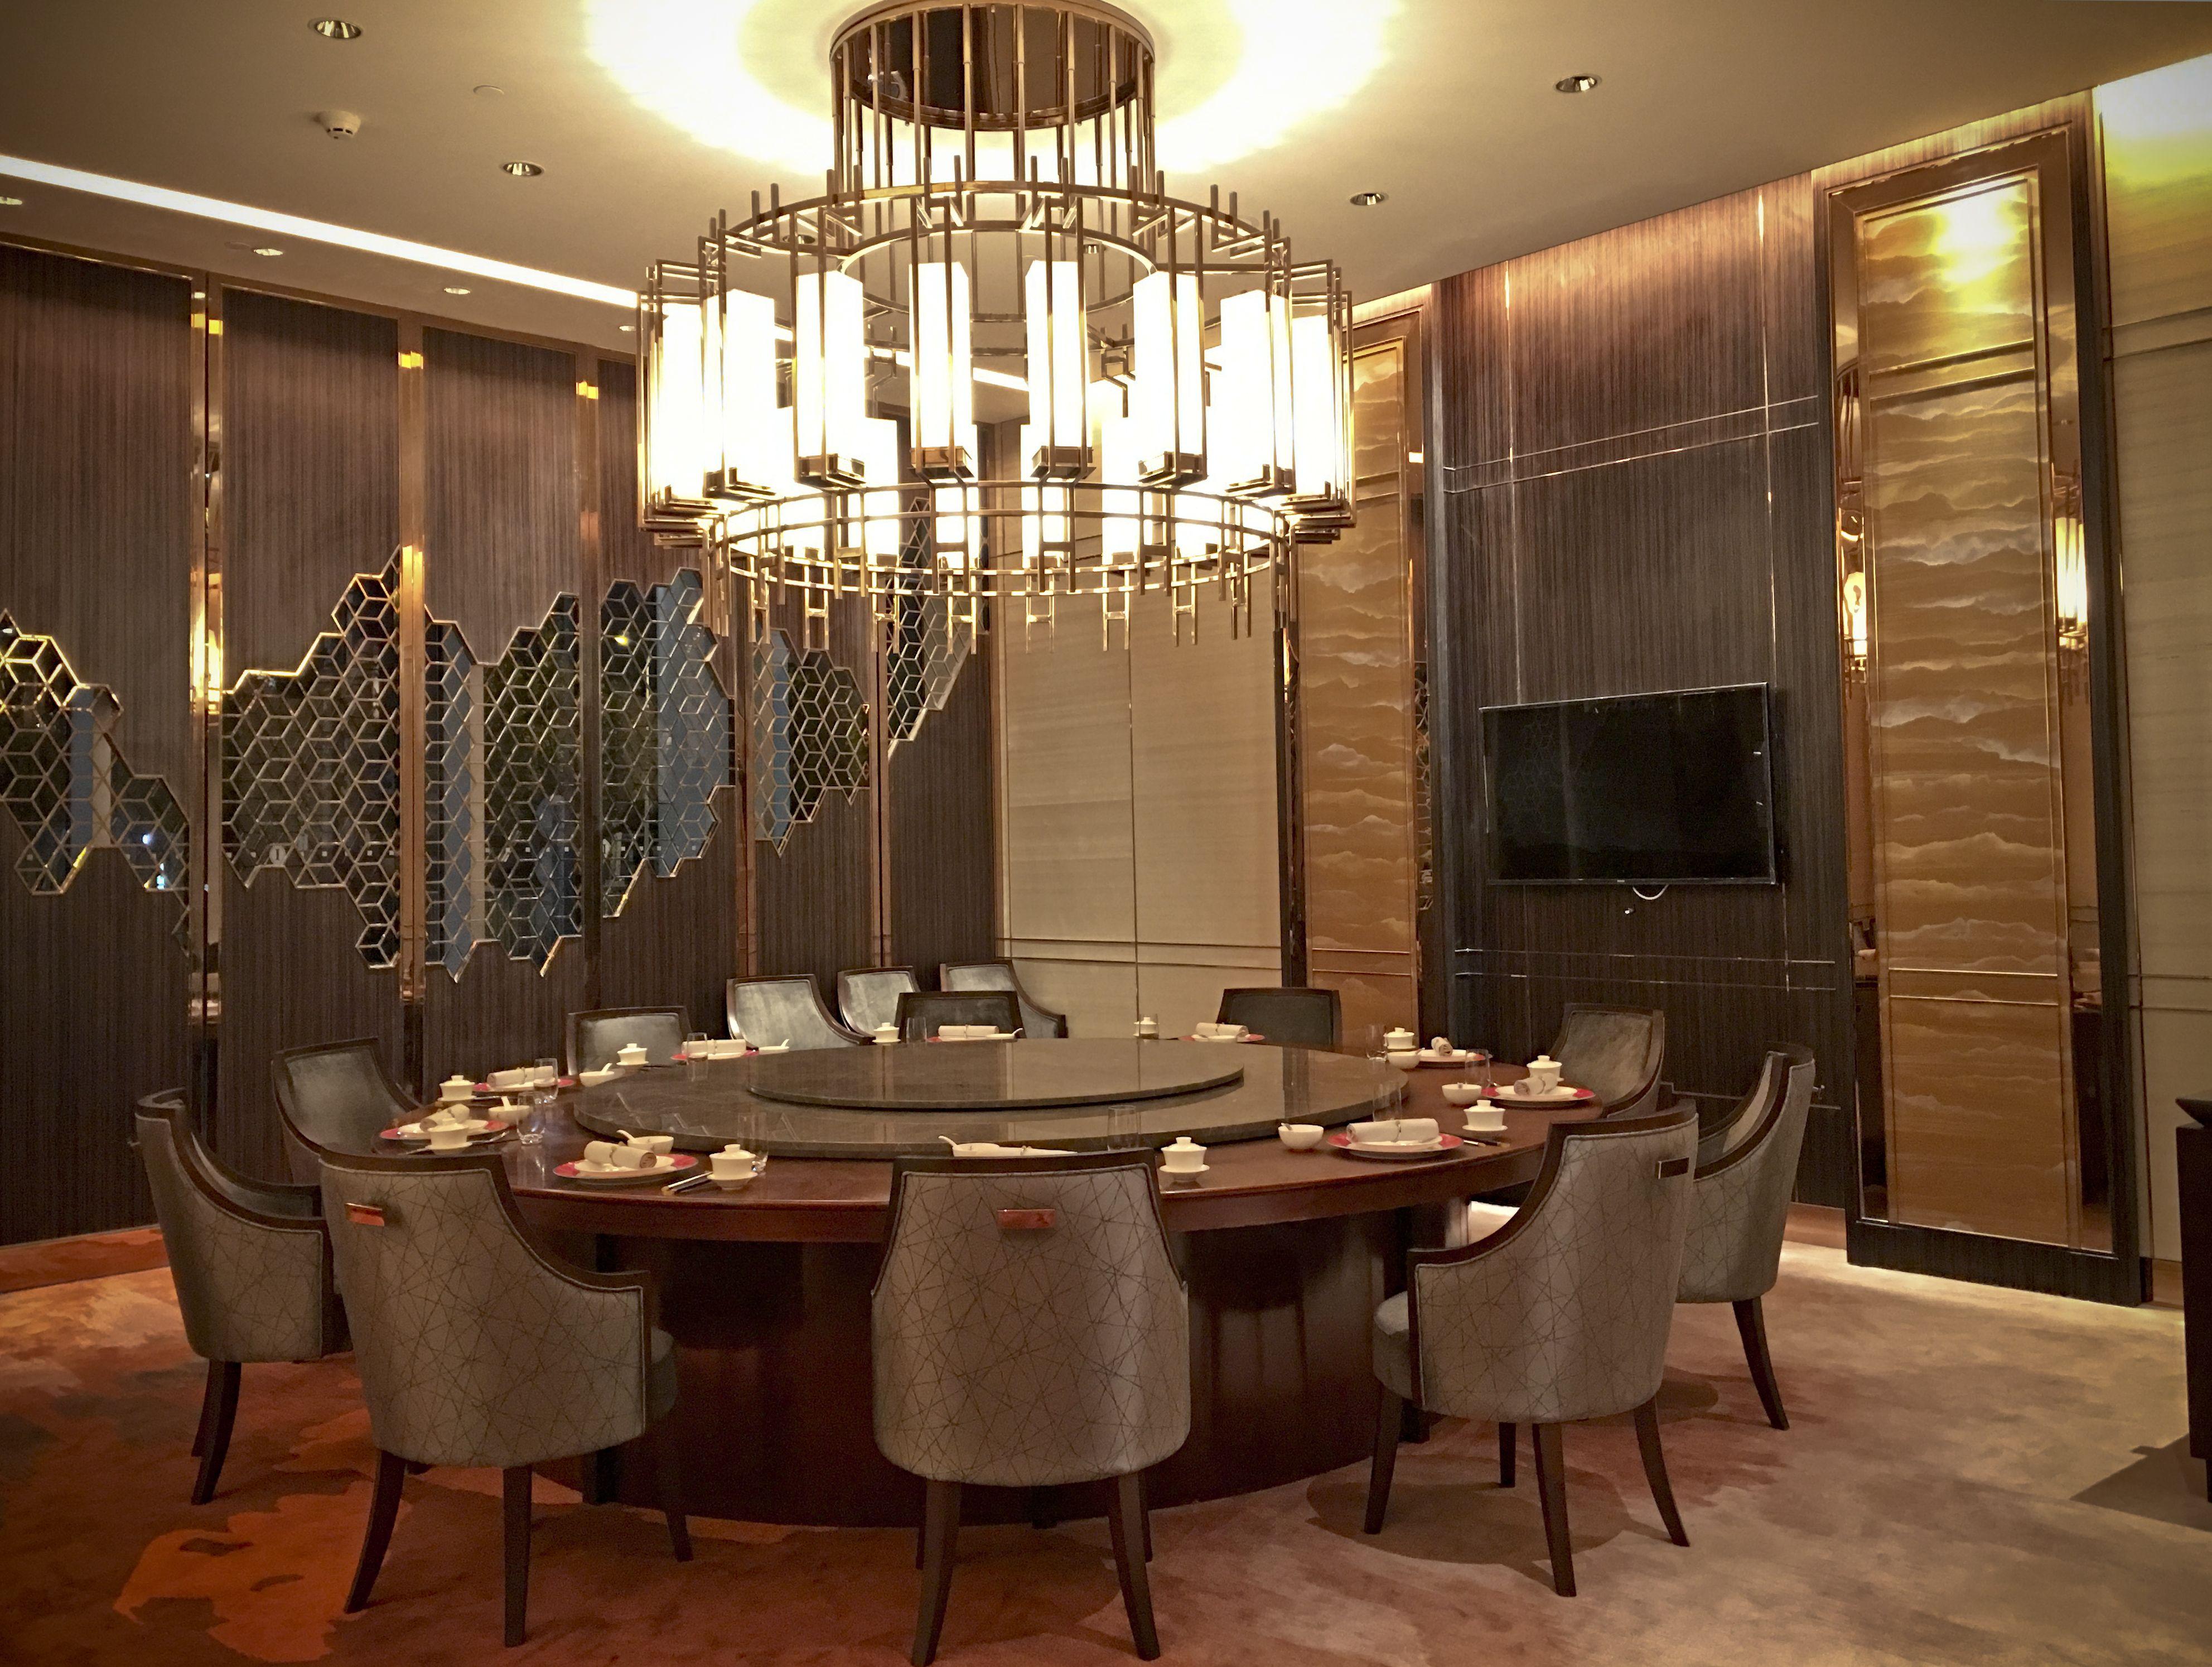 Intercontinental shanghai necc by hba design for Design hotel shanghai